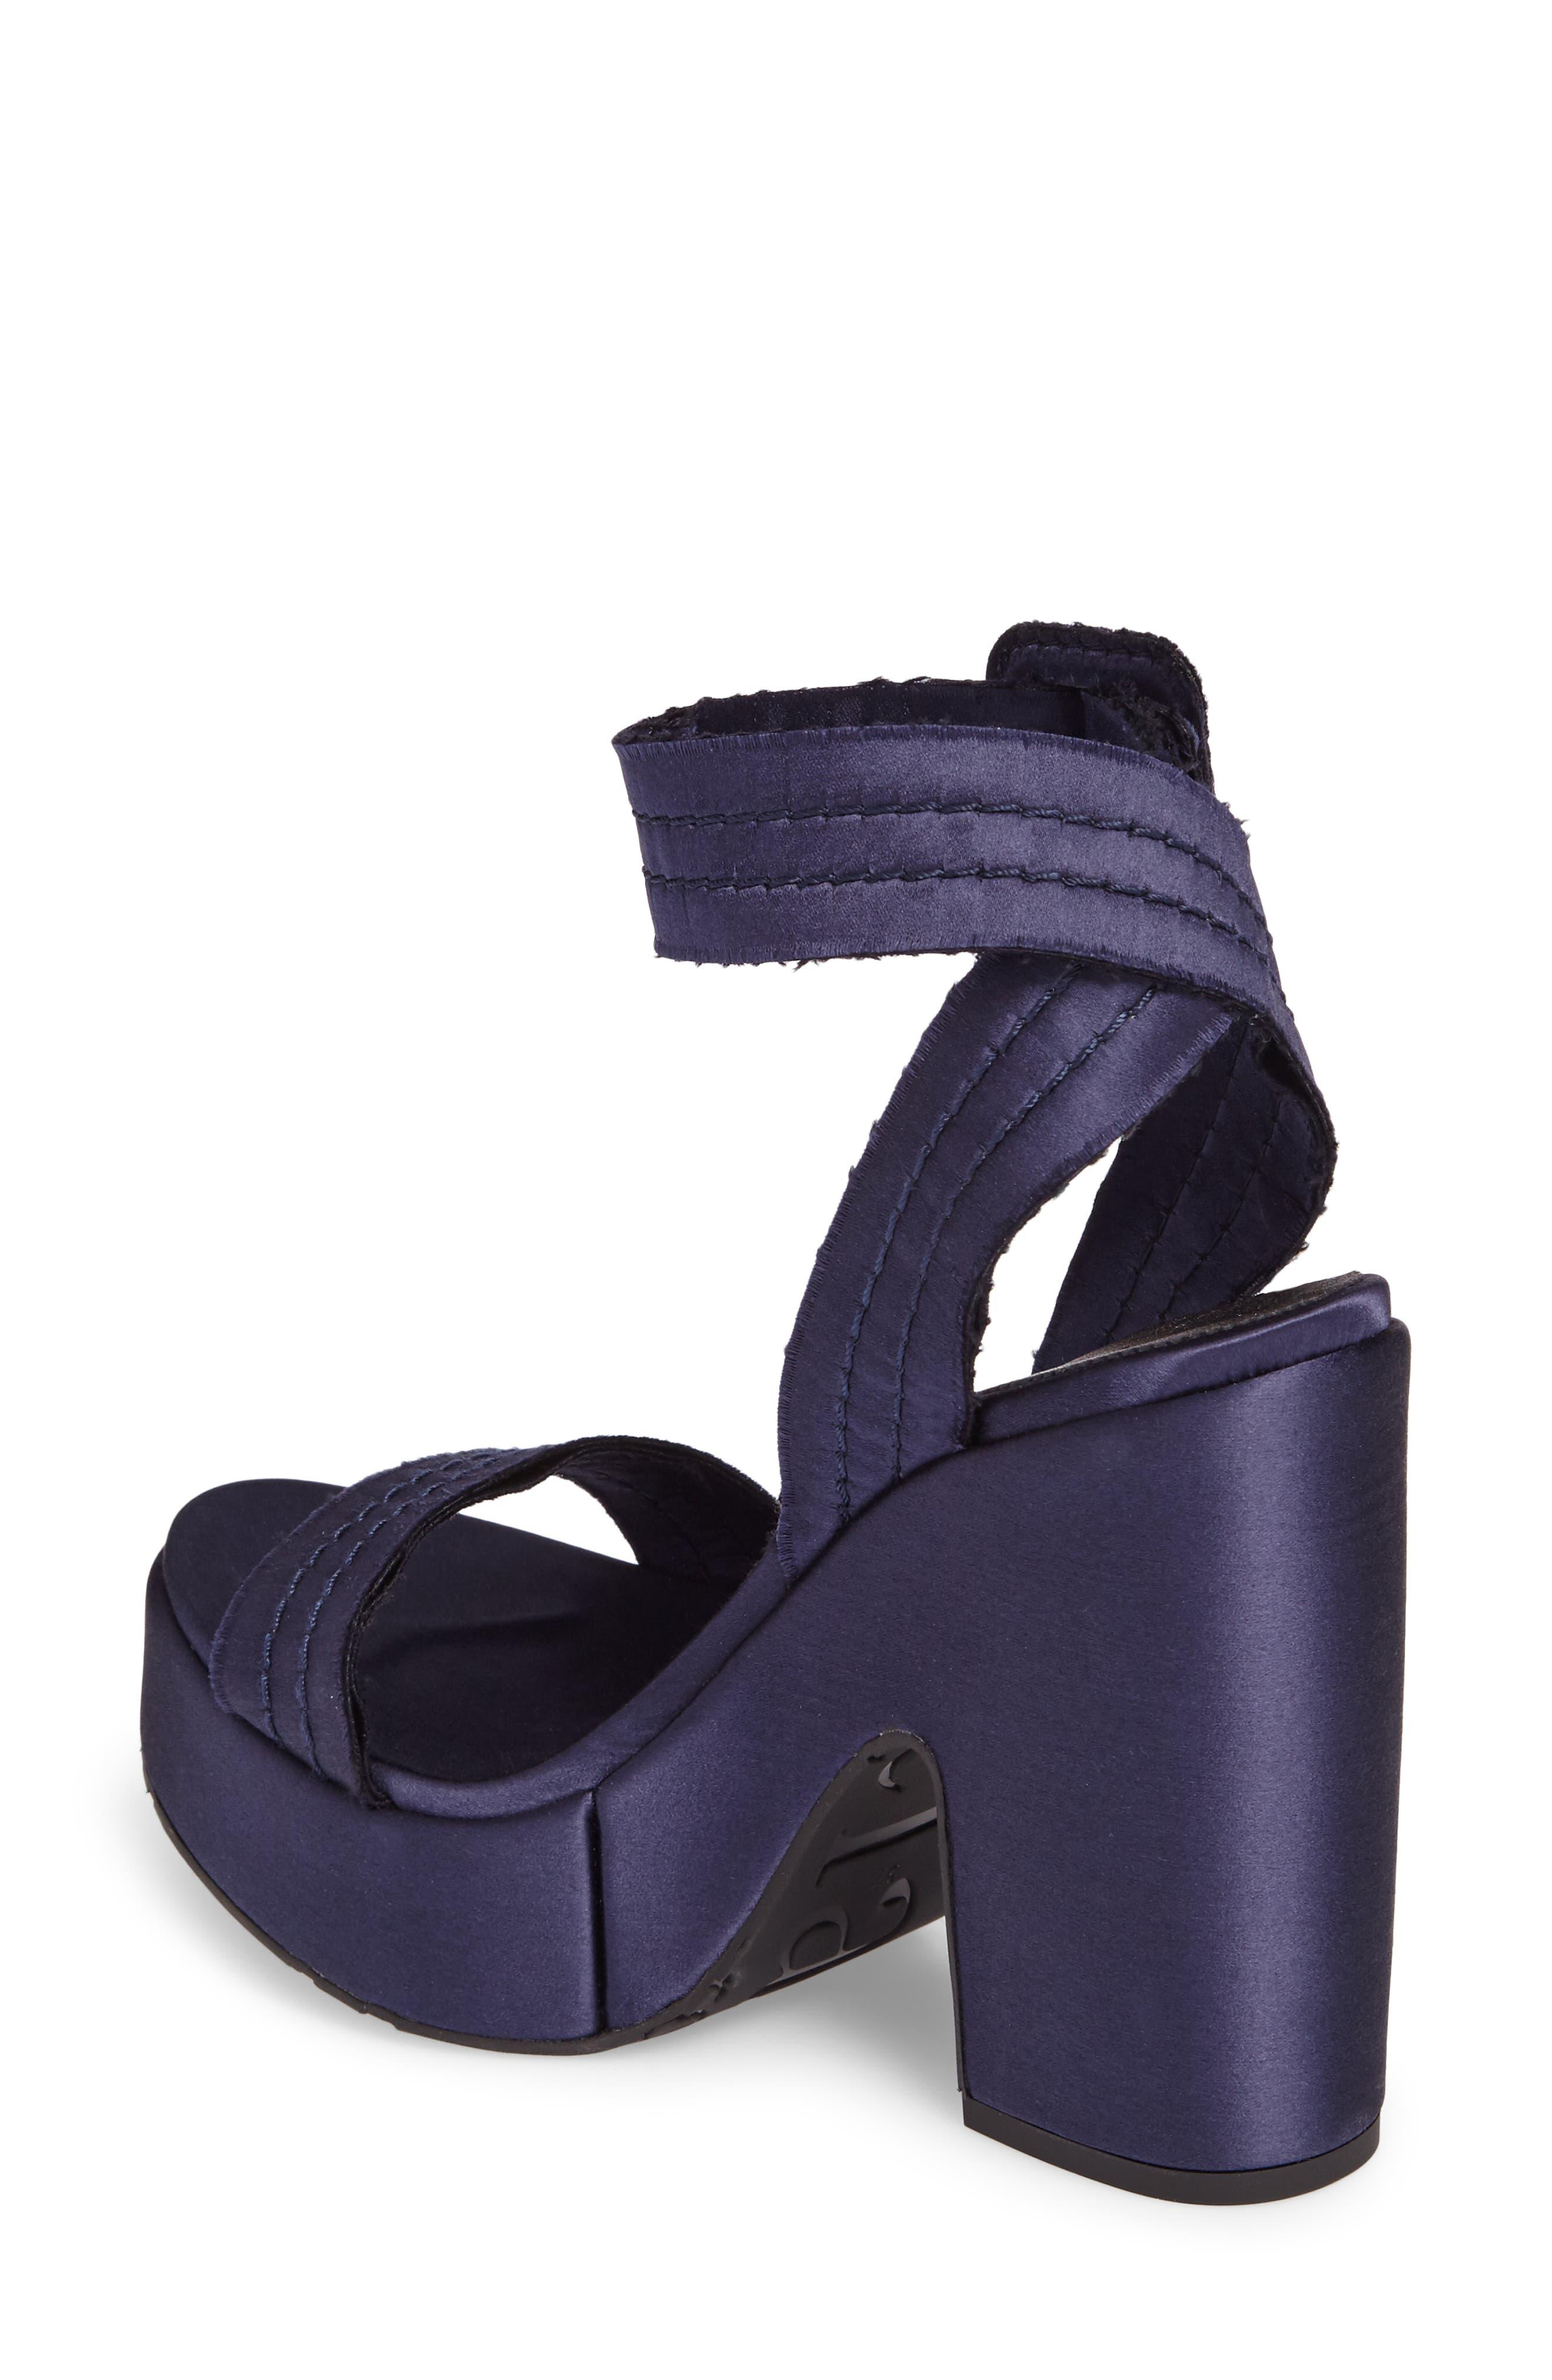 Thora Platform Sandal,                             Alternate thumbnail 2, color,                             400